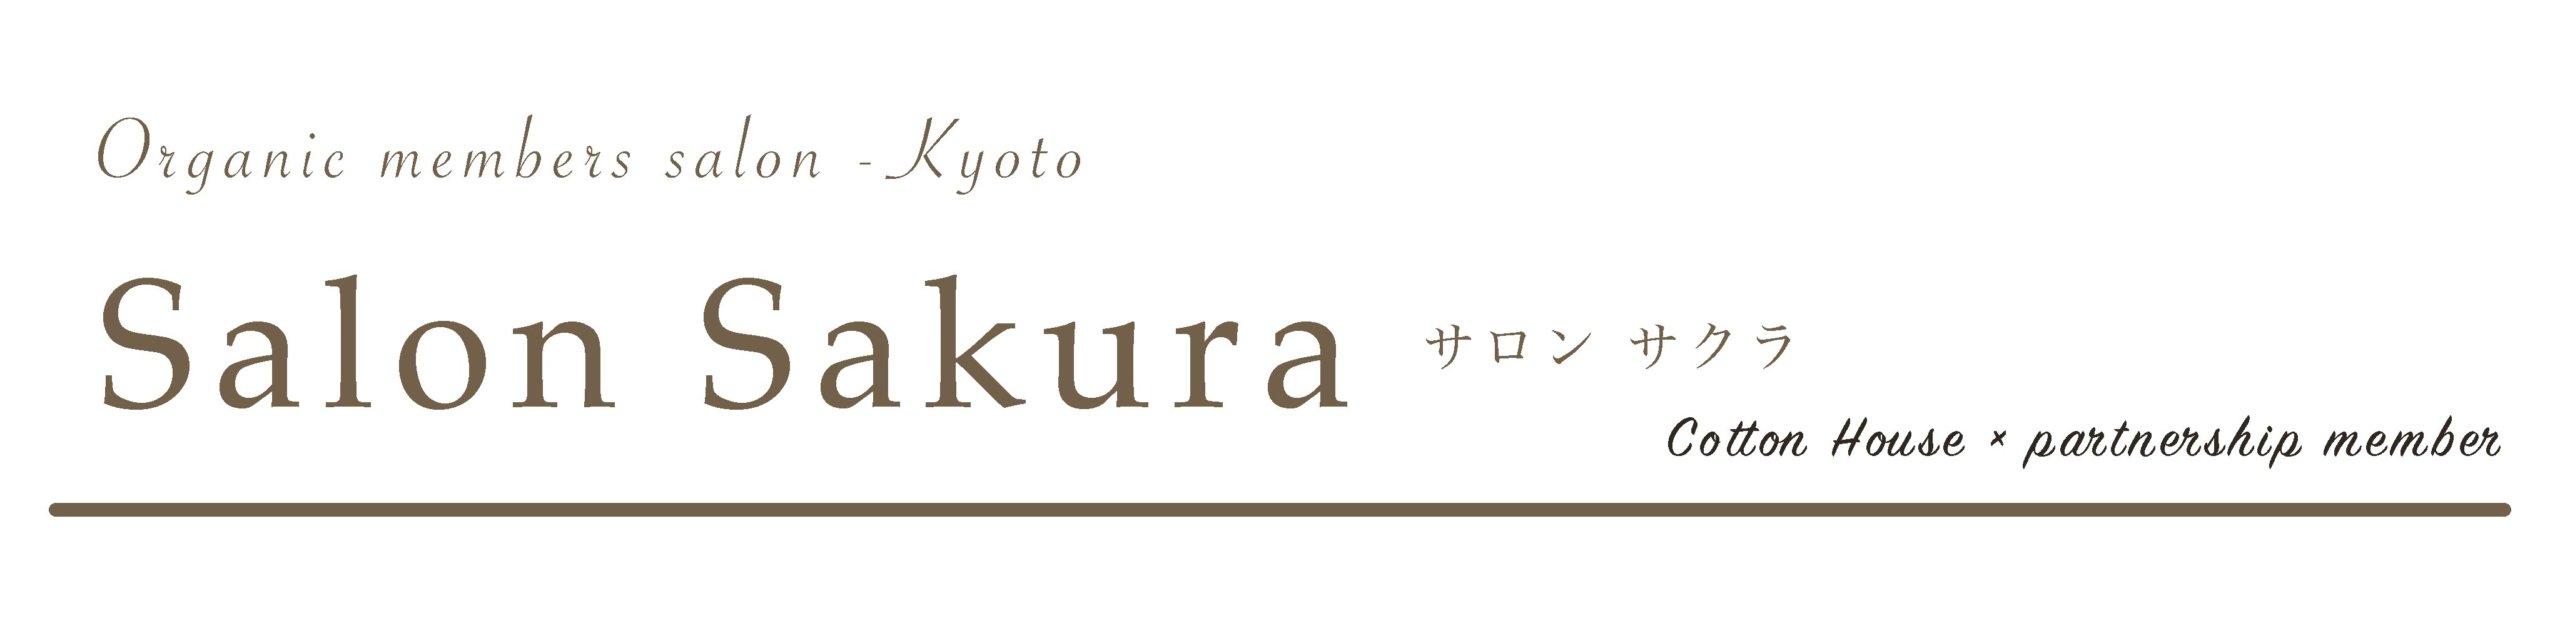 Salon Sakura オーガニックマザーライフ